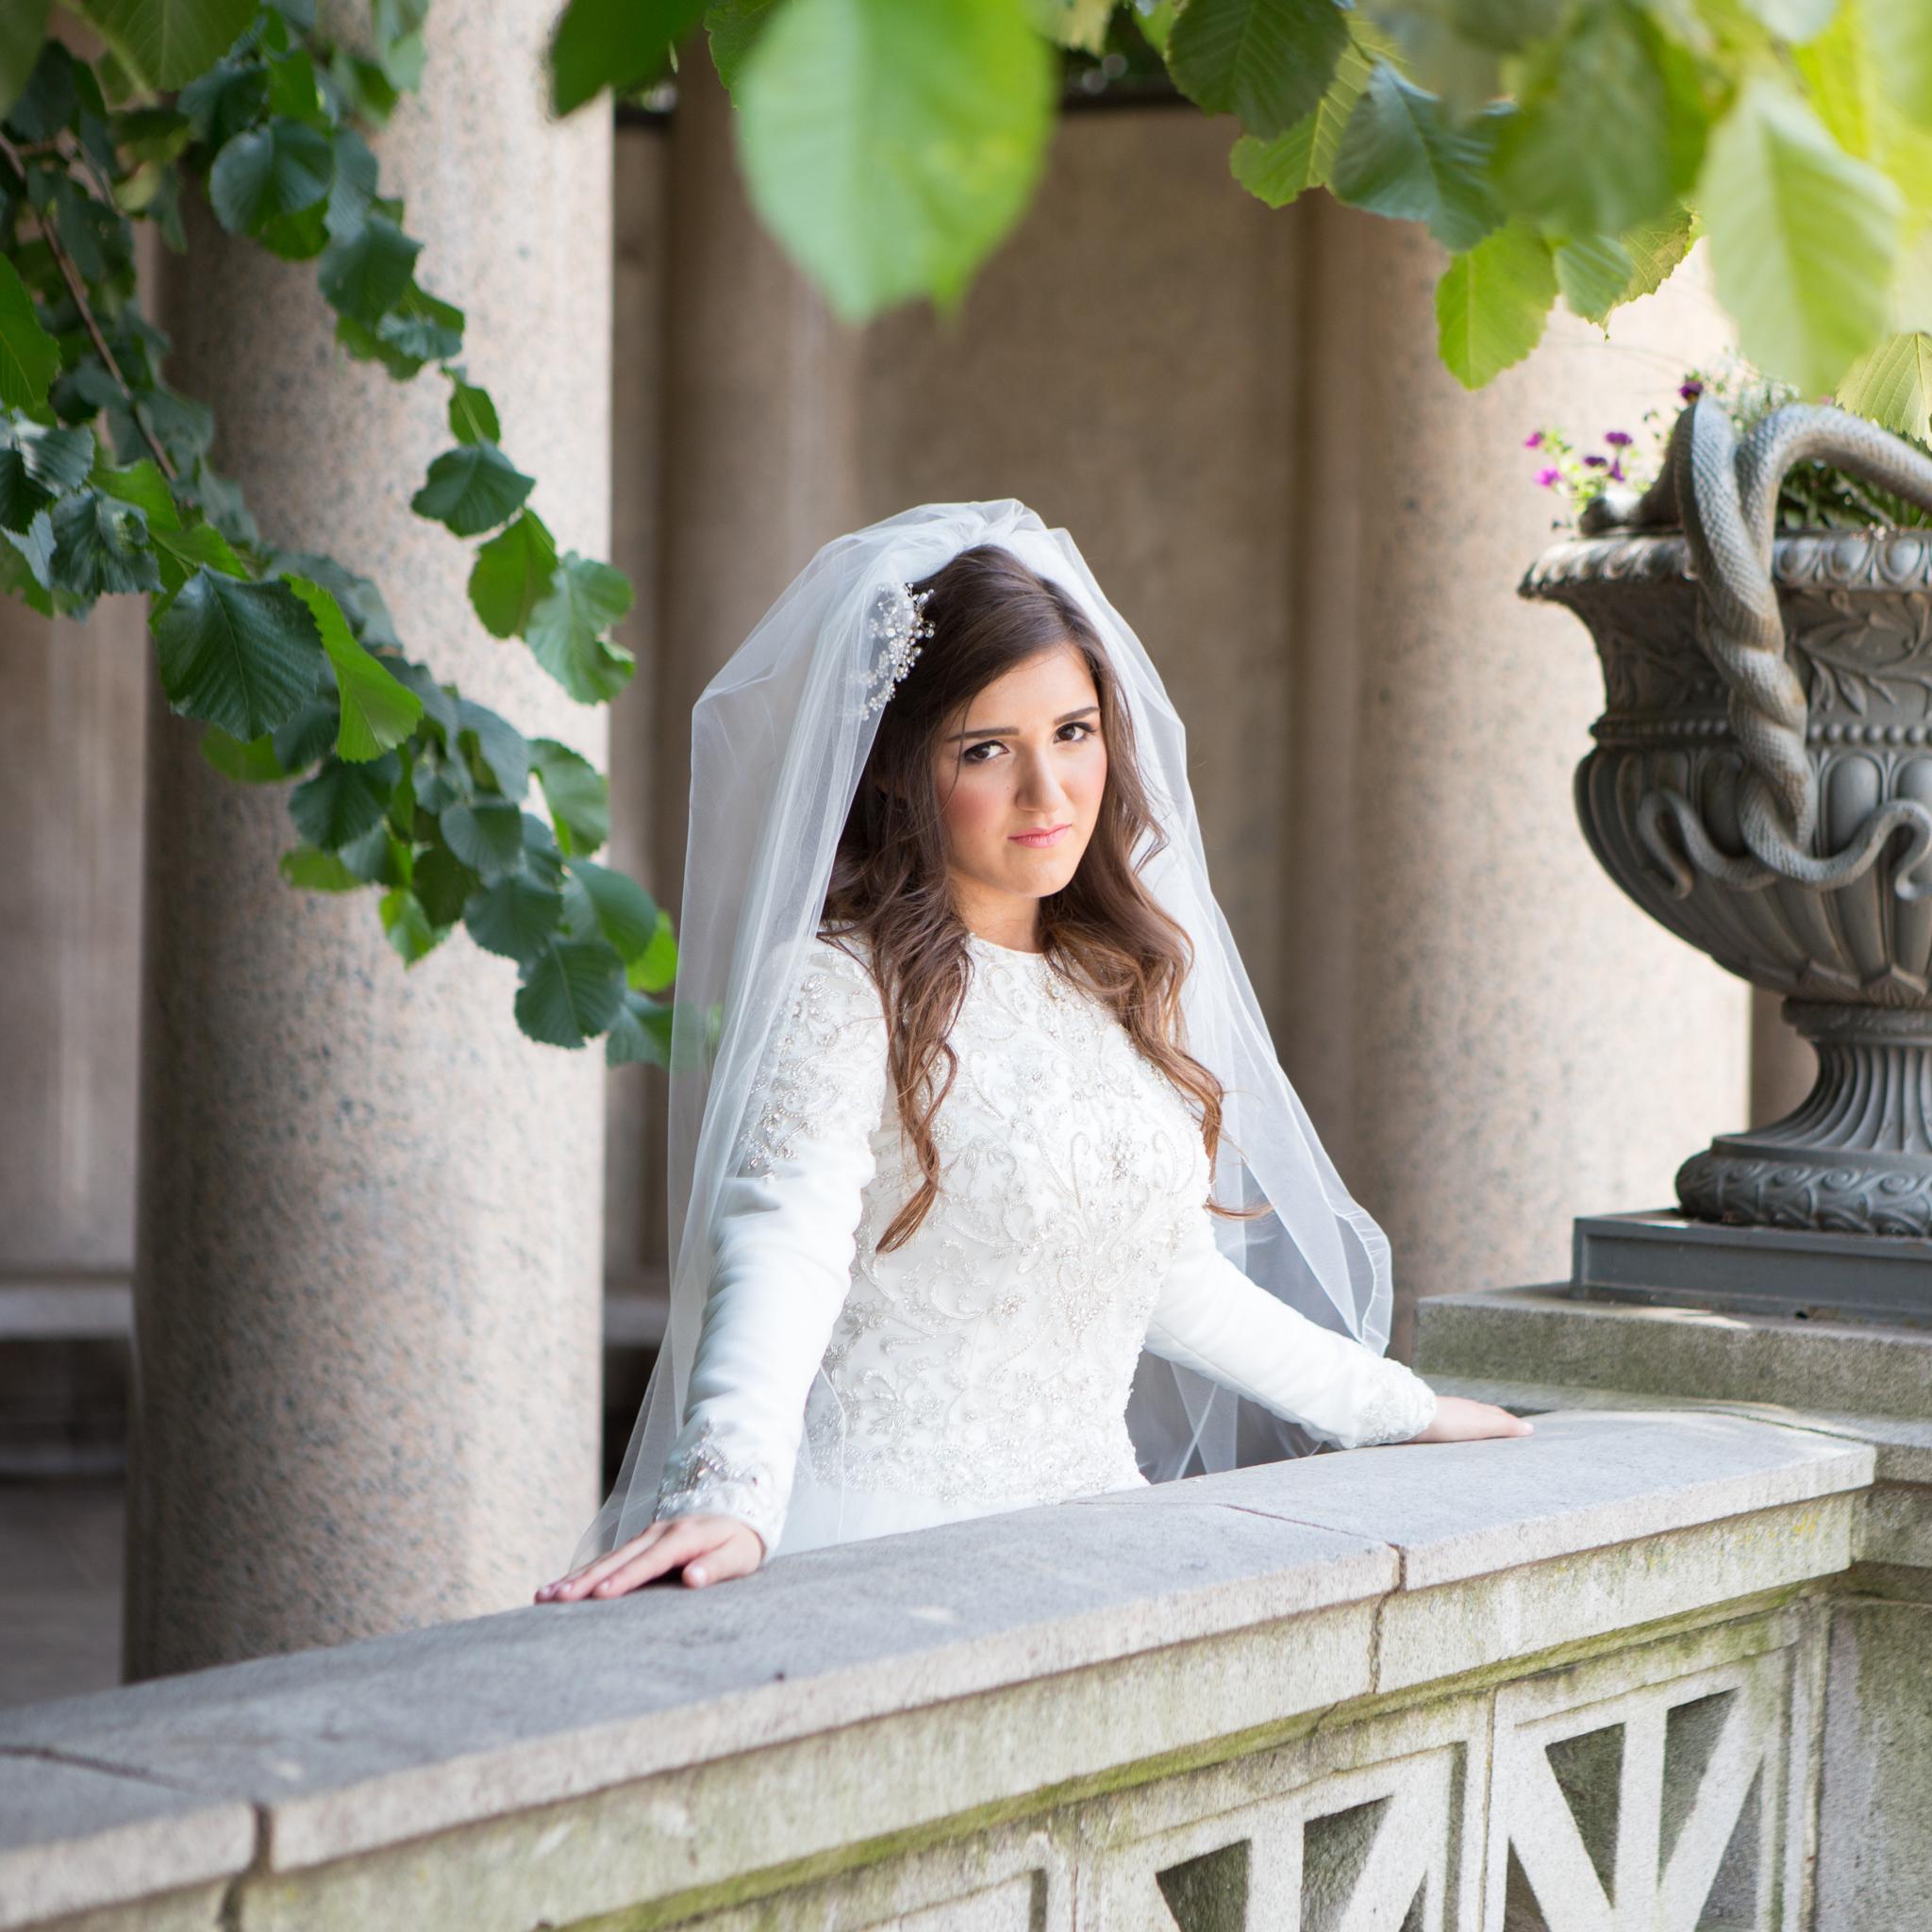 Wedding Iossi and Gitty Khafif  - Eliau Piha studio photography, new york, events, people 770 brooklyn -0120.jpg